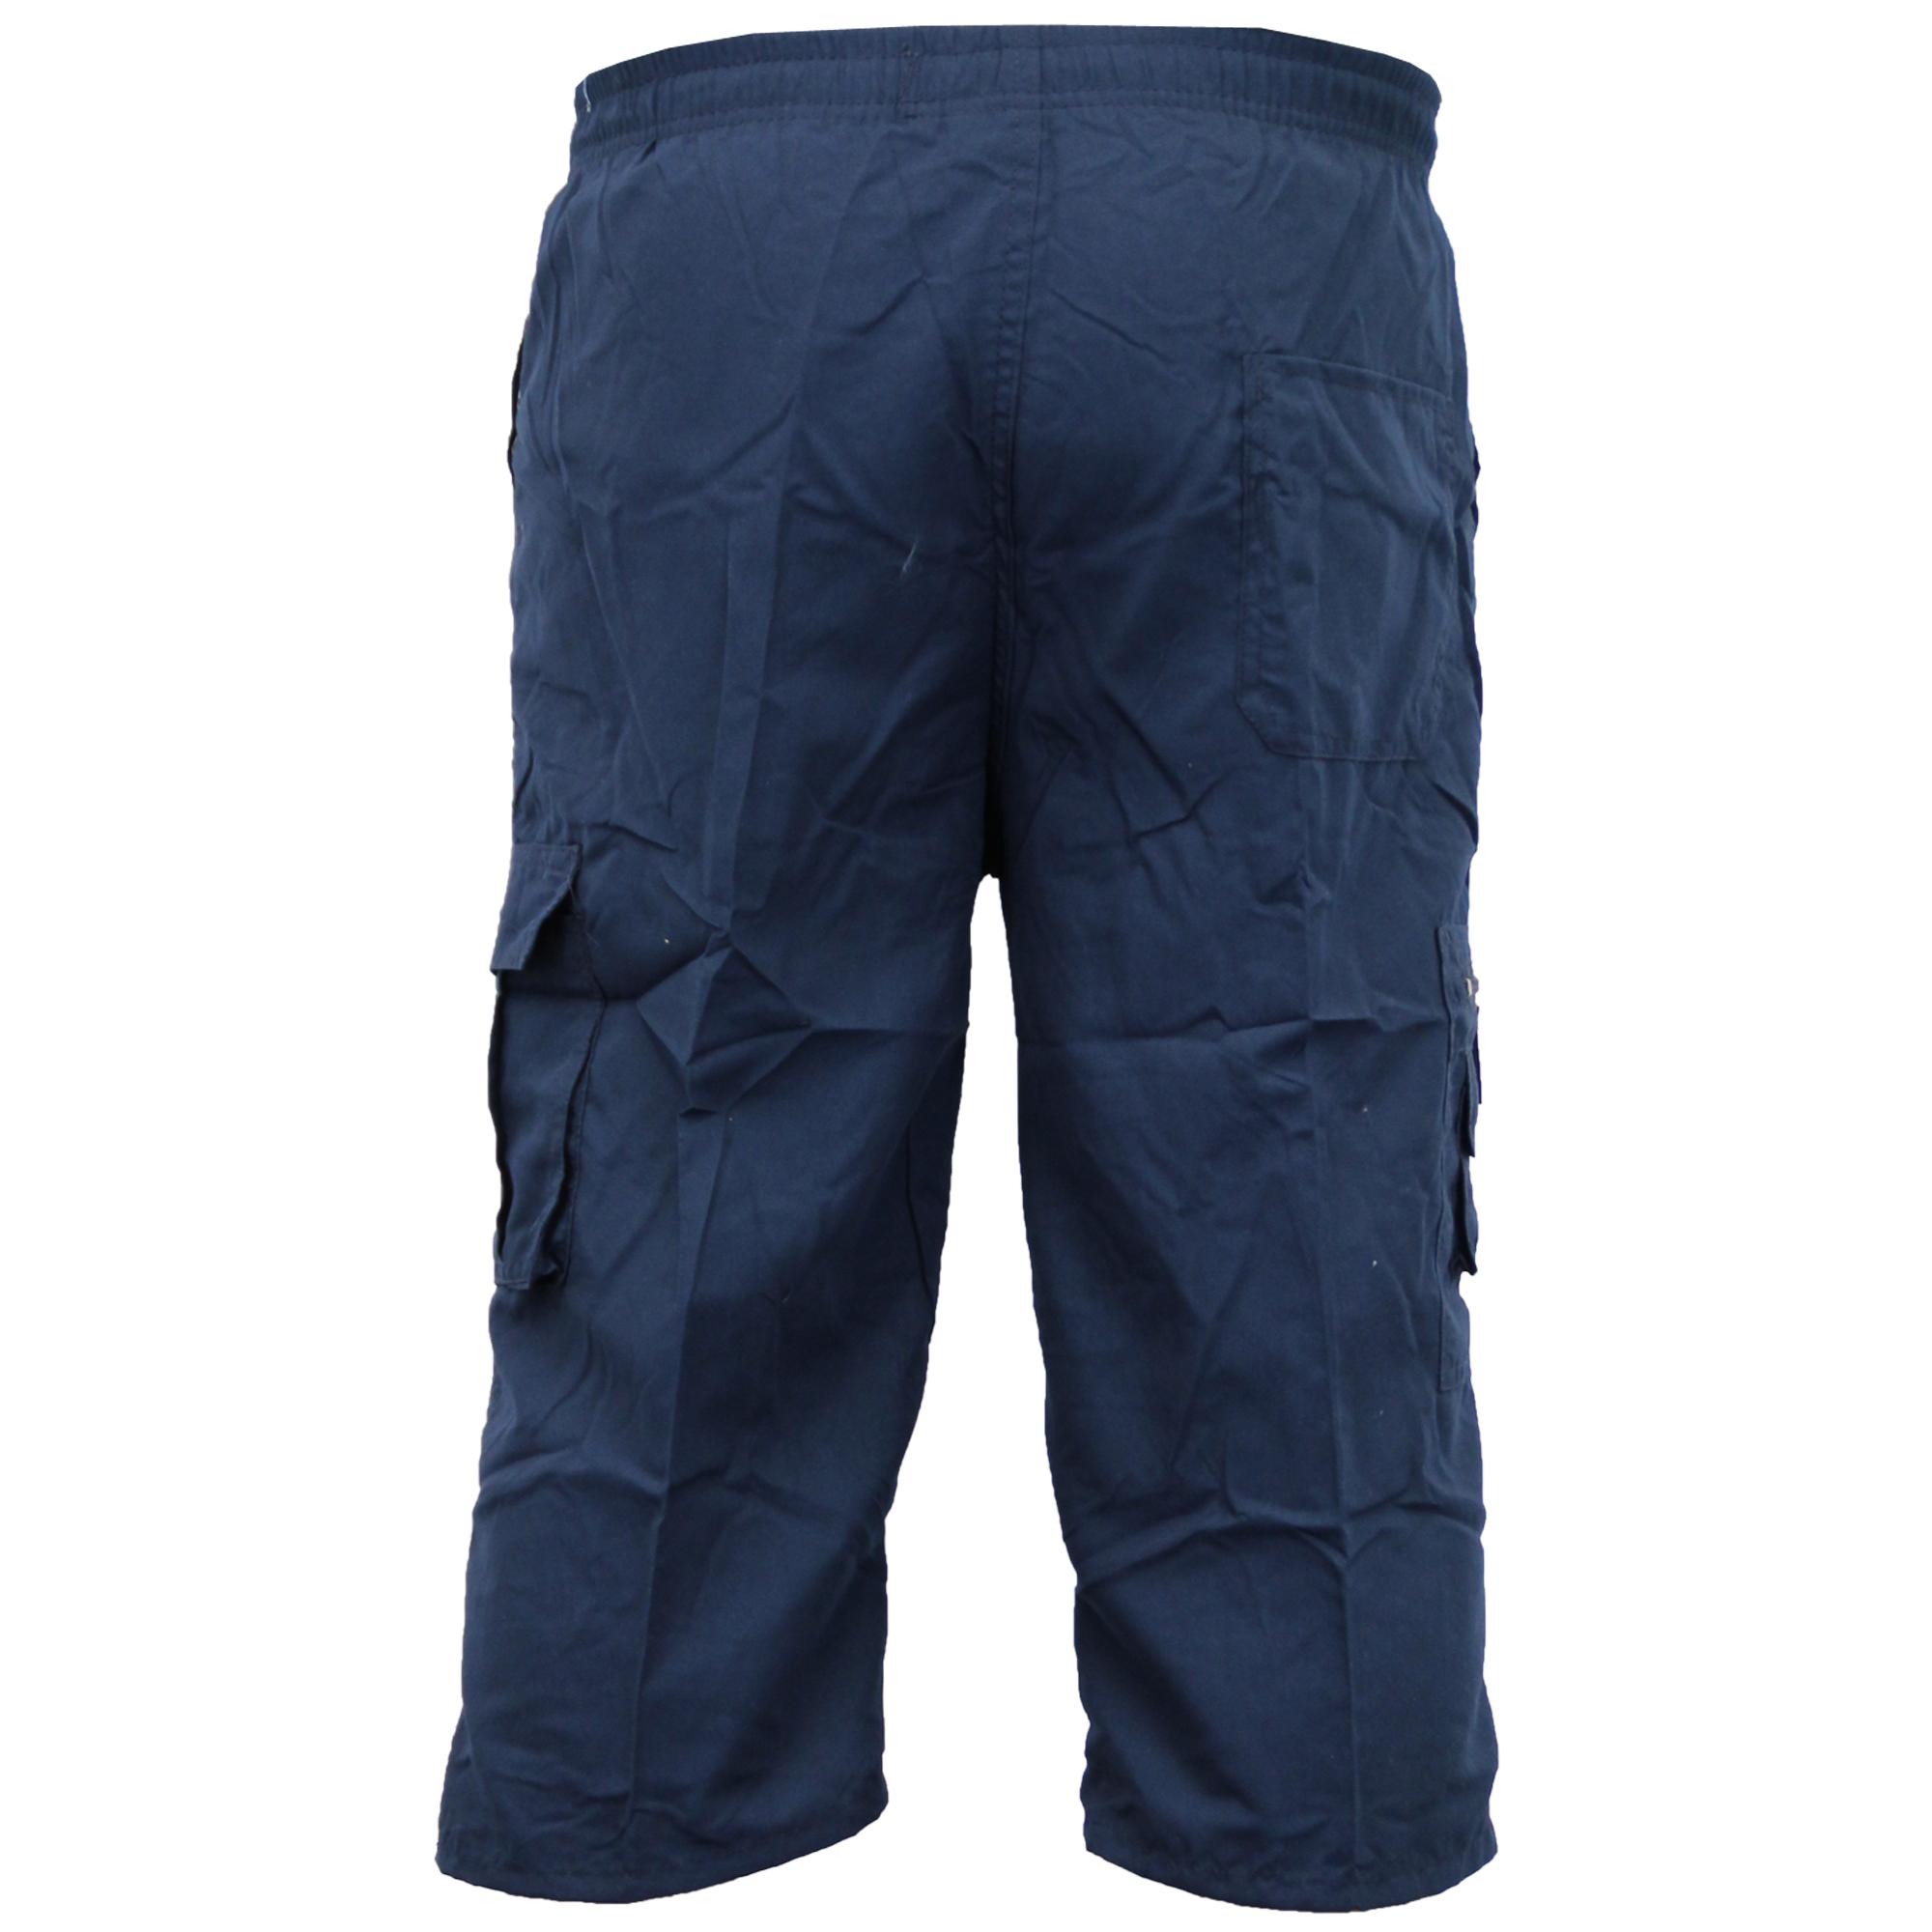 Mens-Combat-Cargo-Shorts-3-4-Length-Plain-Sport-Fashion-Casual-Summer-New thumbnail 16